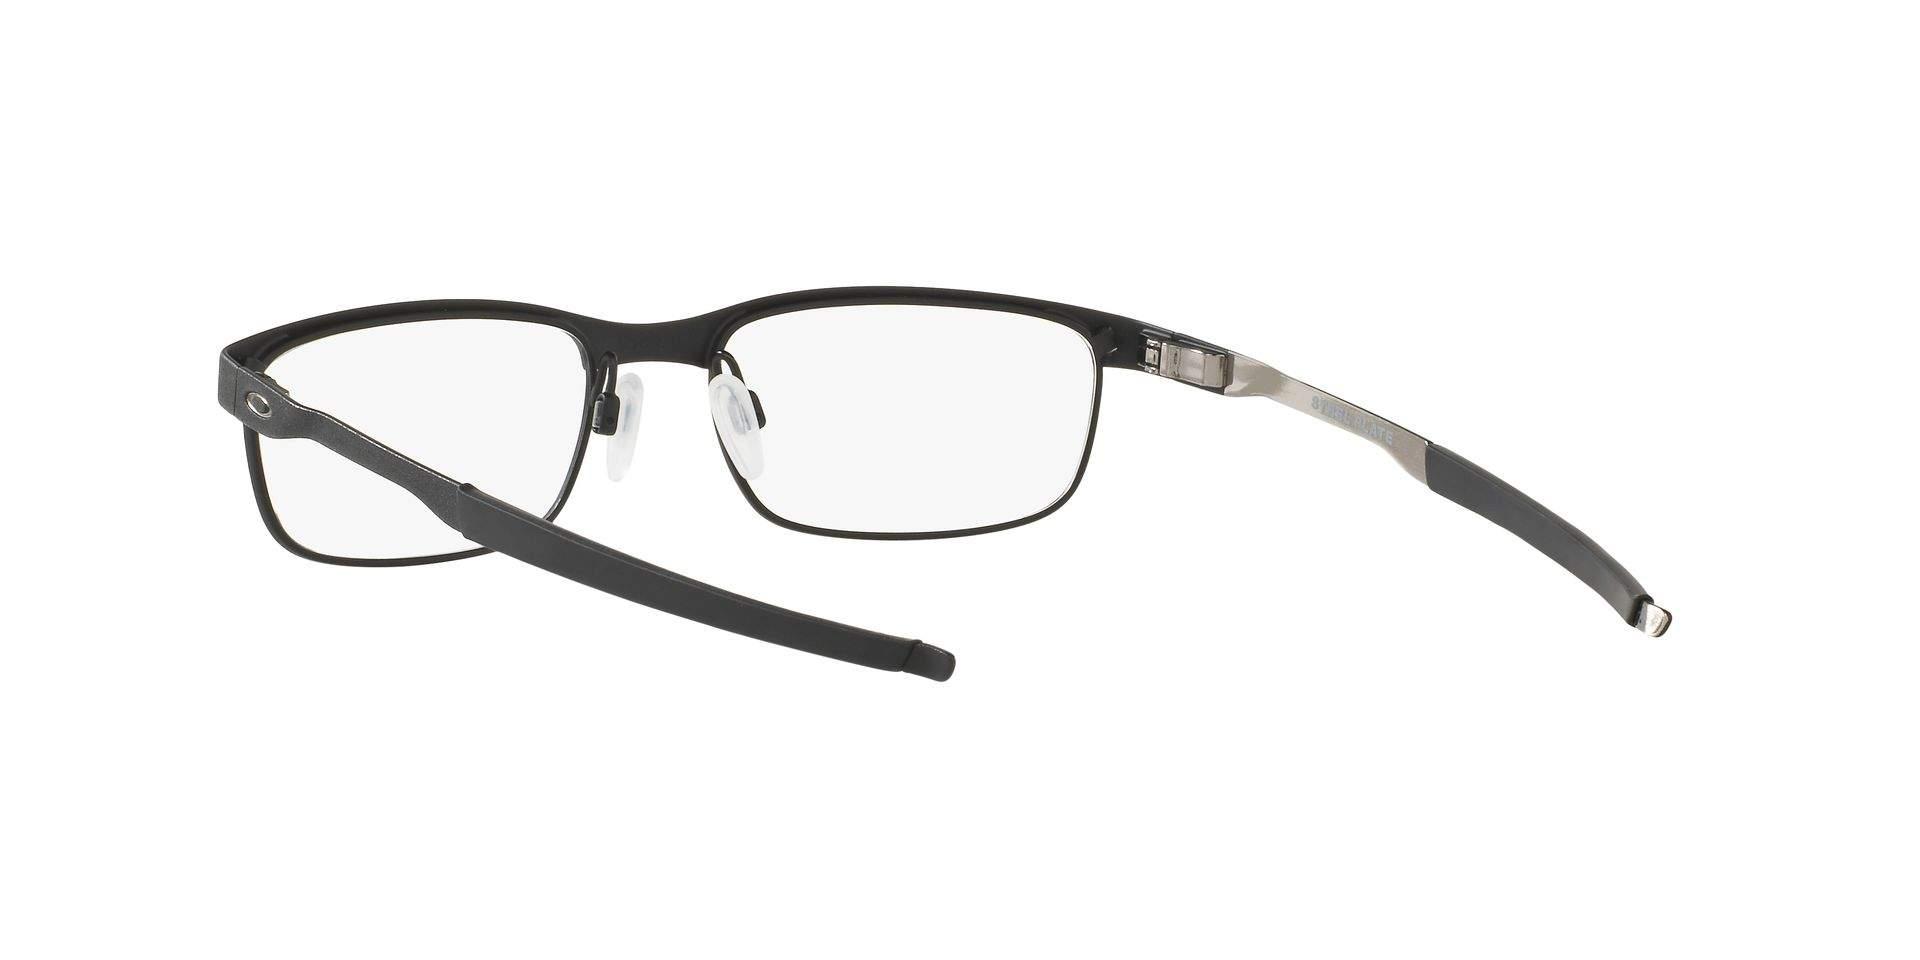 c5d8584ac8 Eyeglasses Oakley Steel plate Black Matte OX3222 01 54-18 Medium